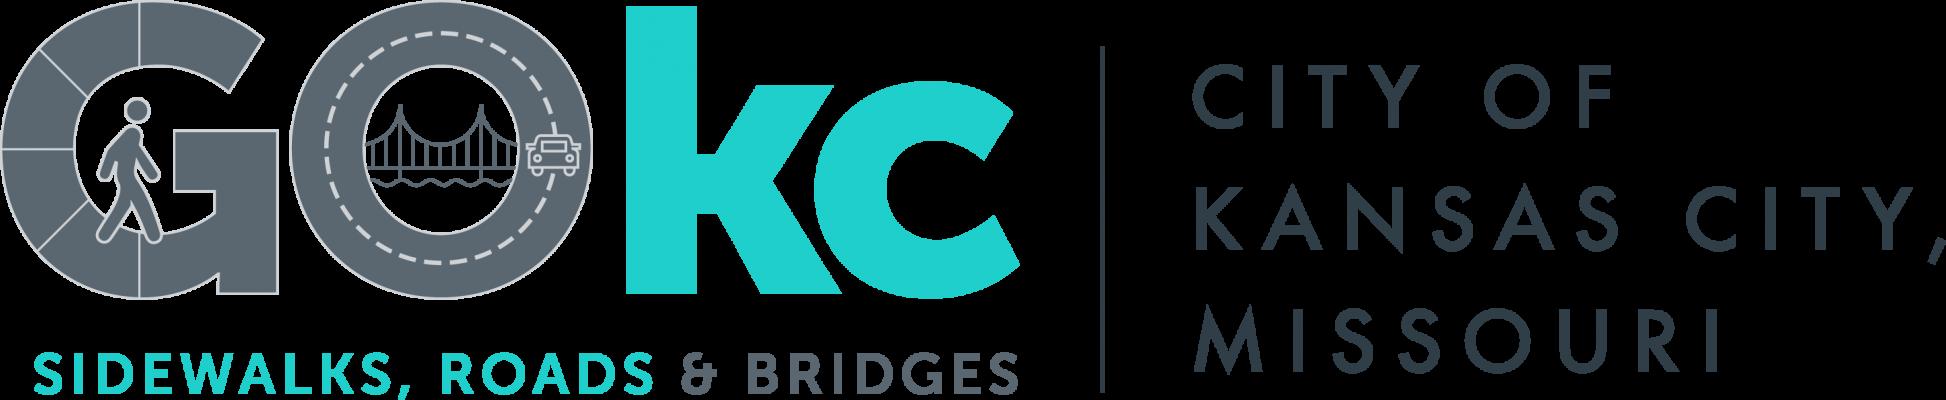 GOkc Sidewalks Roads & Bridges